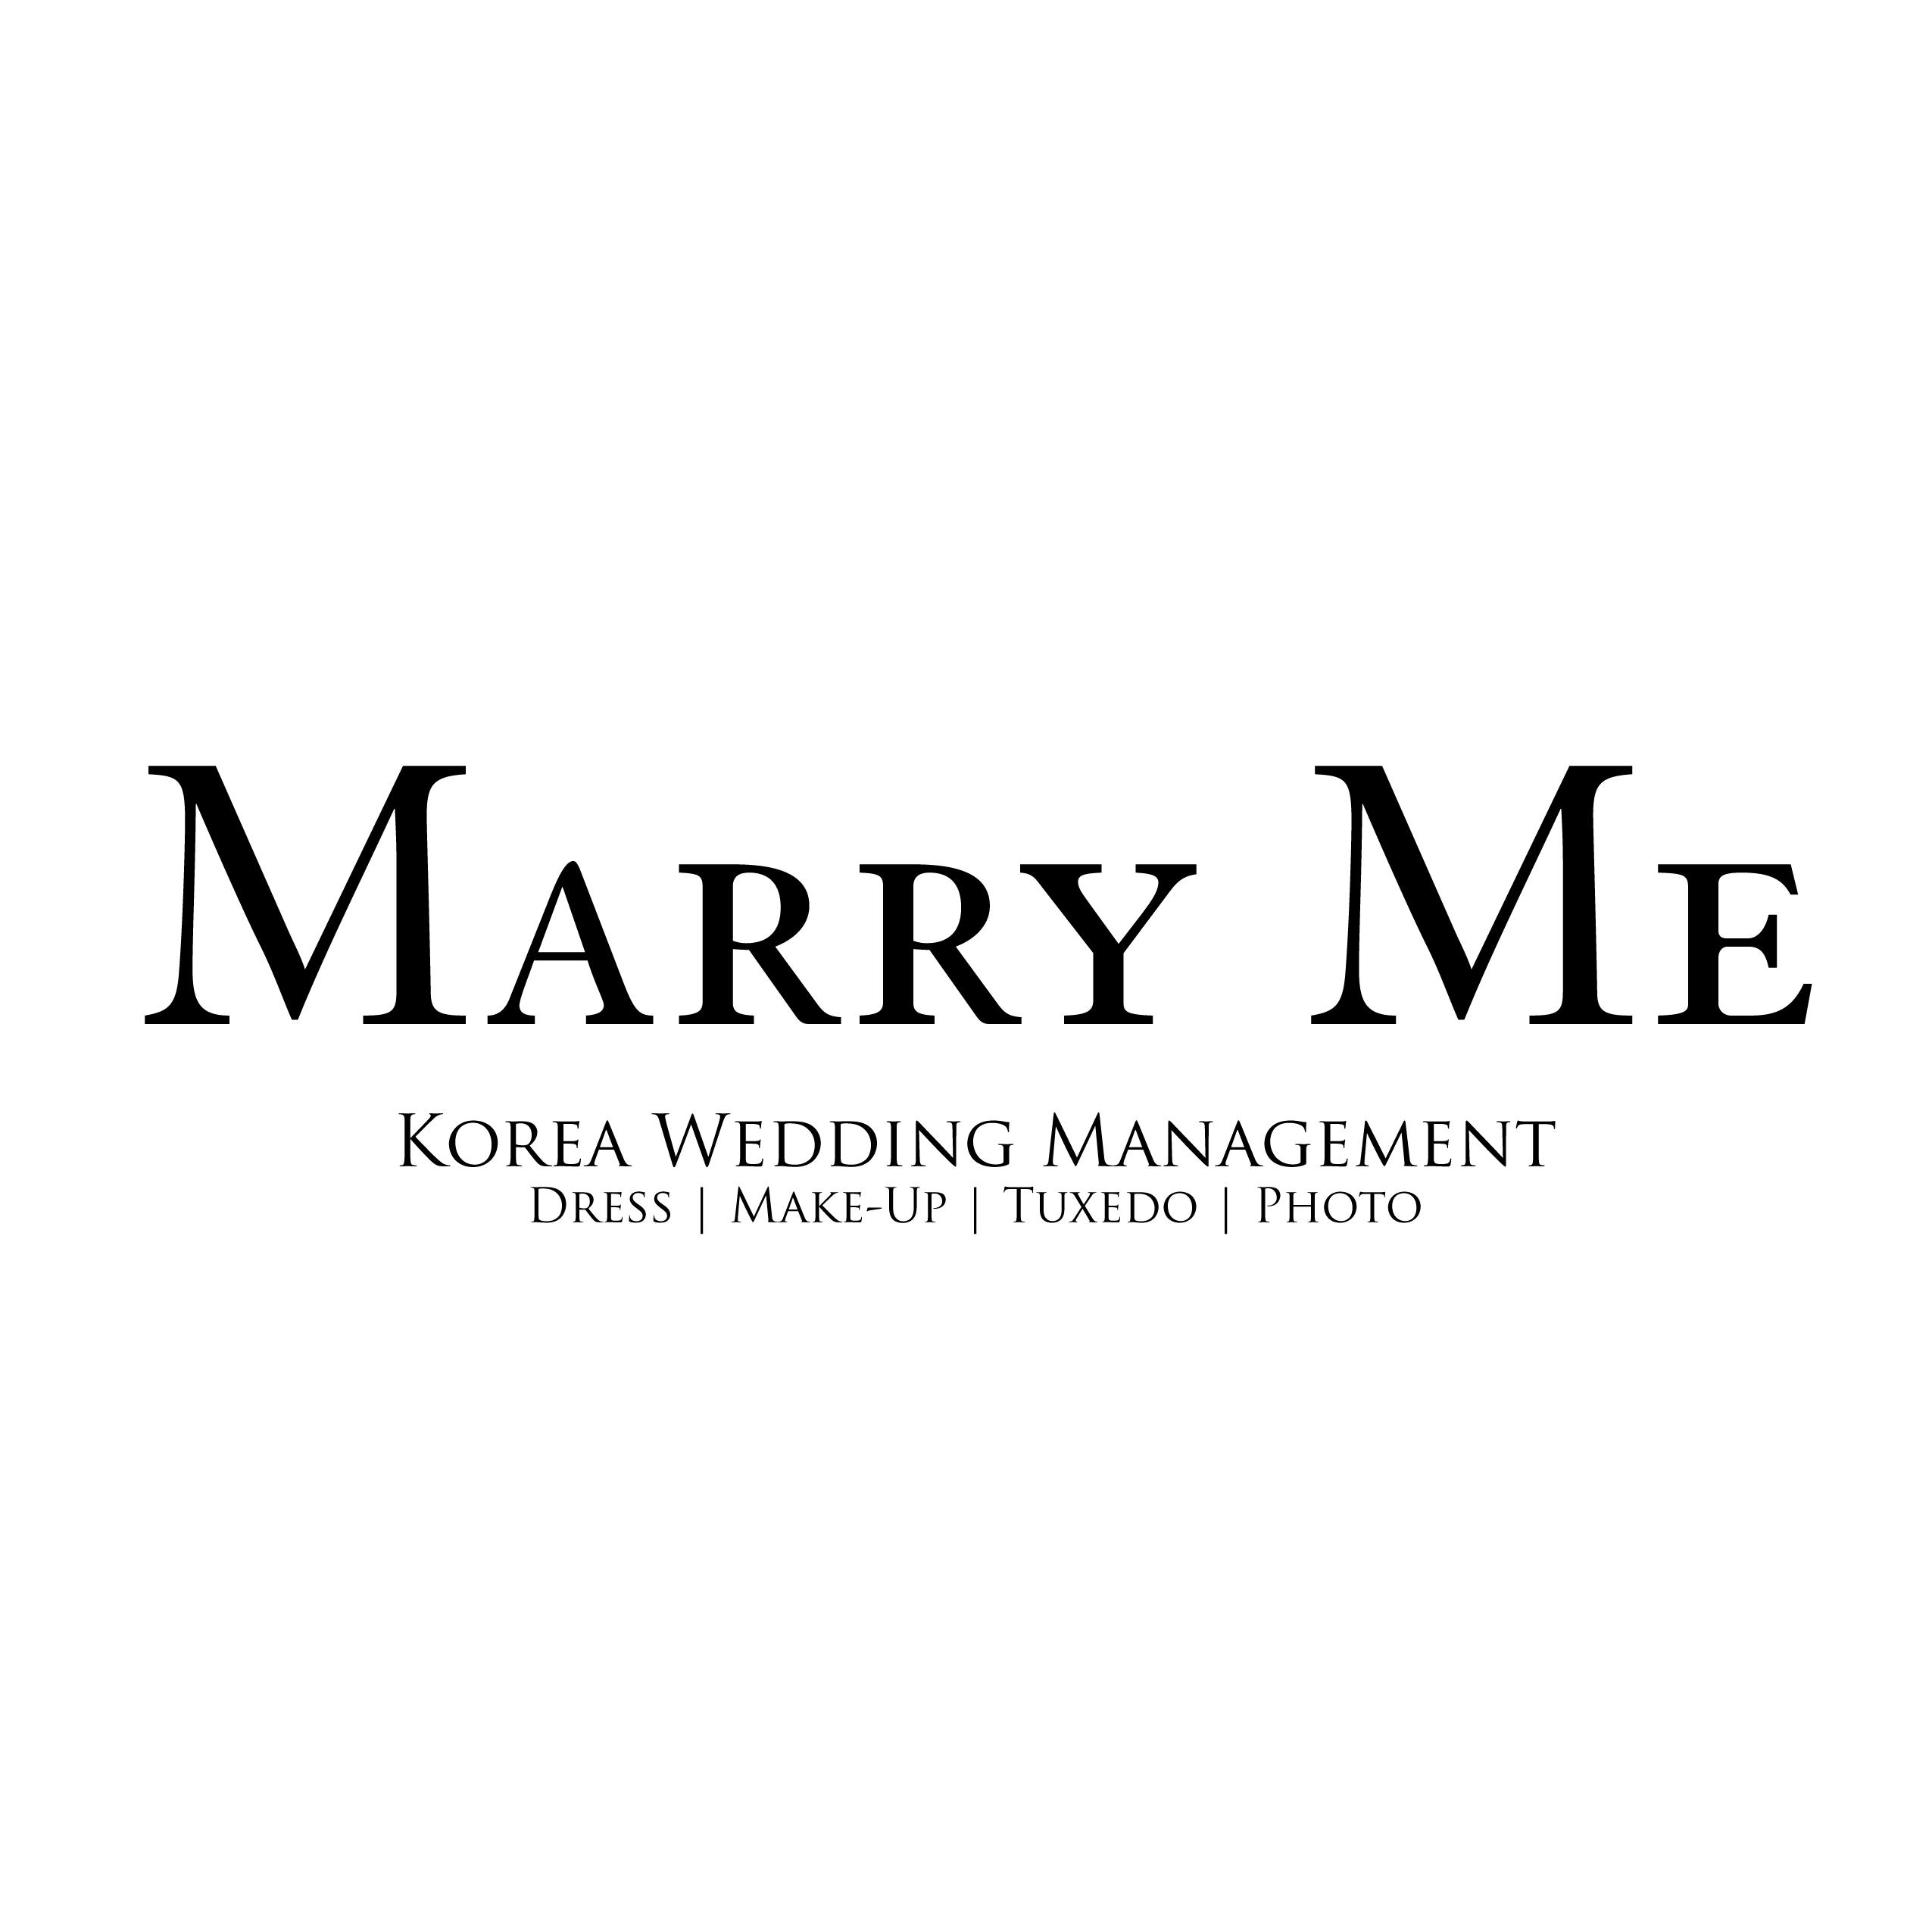 marry me 韩国婚礼形象设计